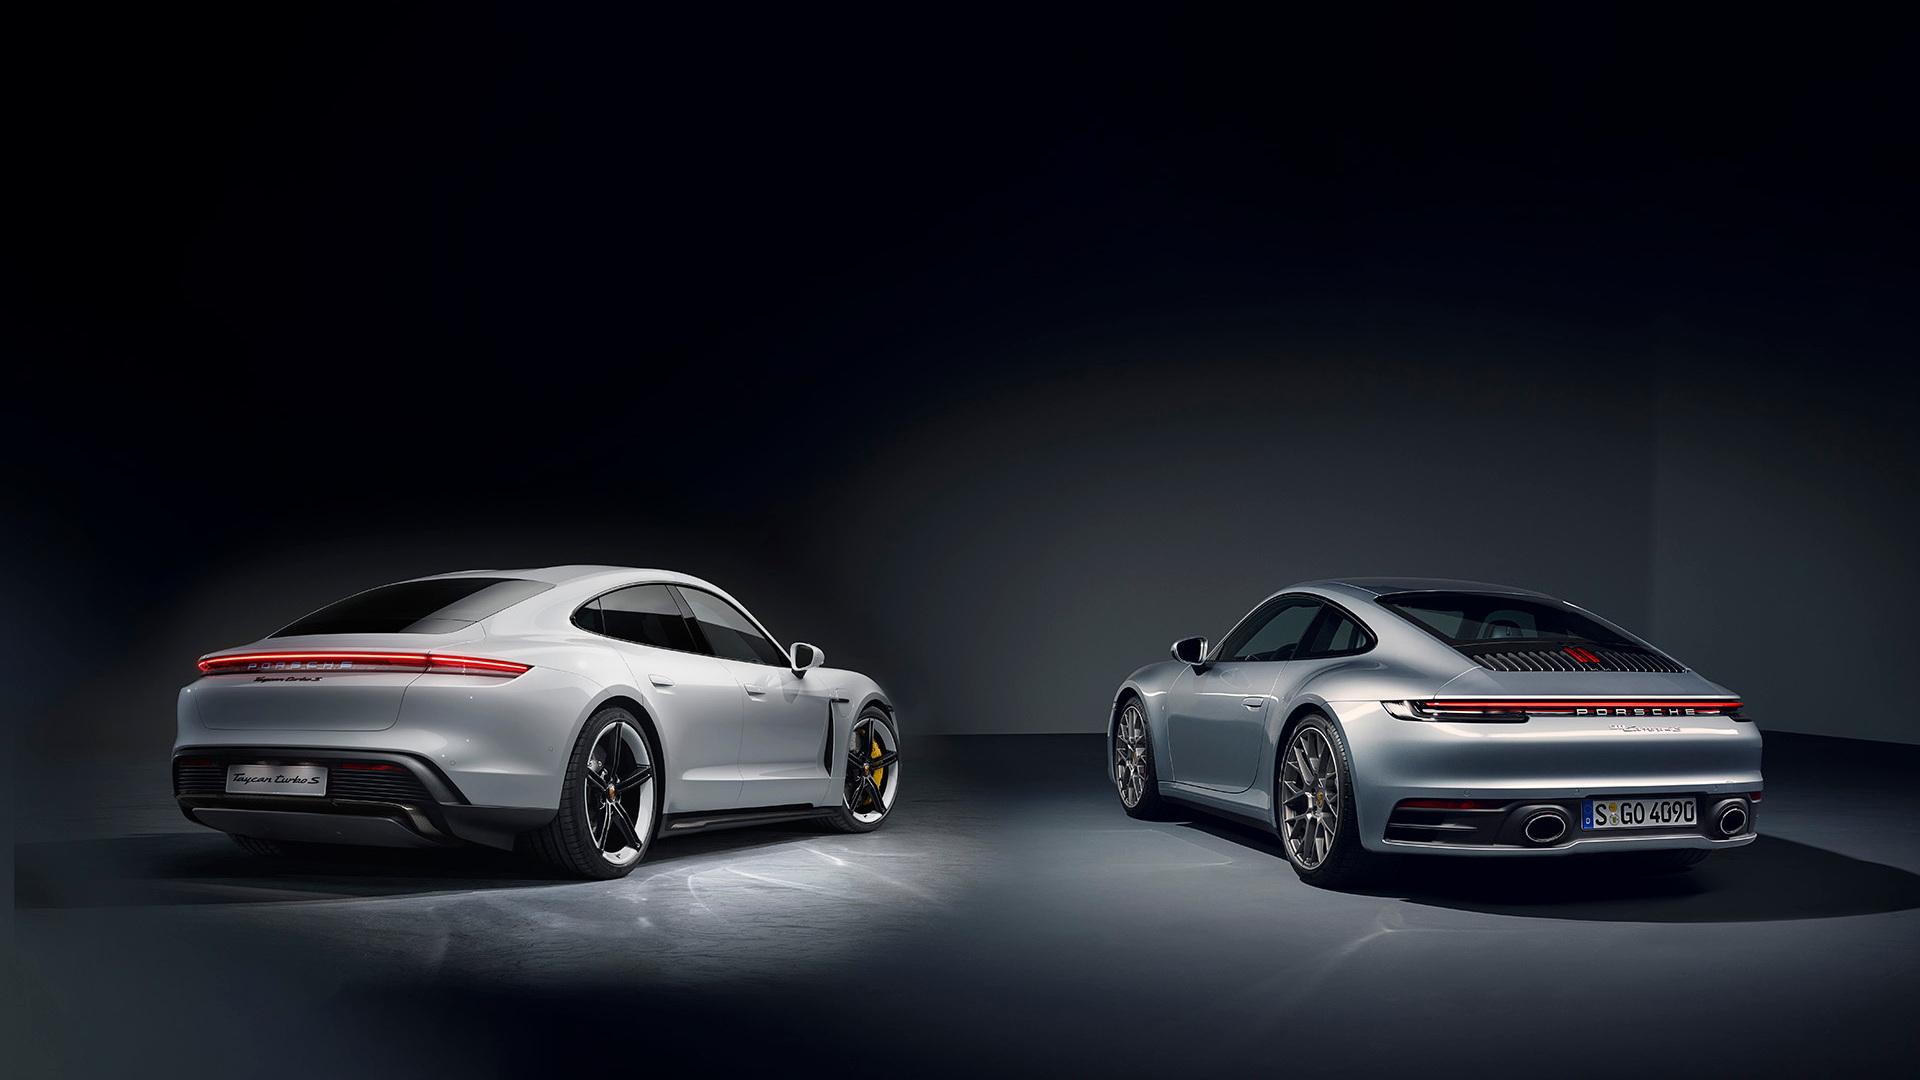 2020 Porsche 911 vs. 2020 Porsche Taycan